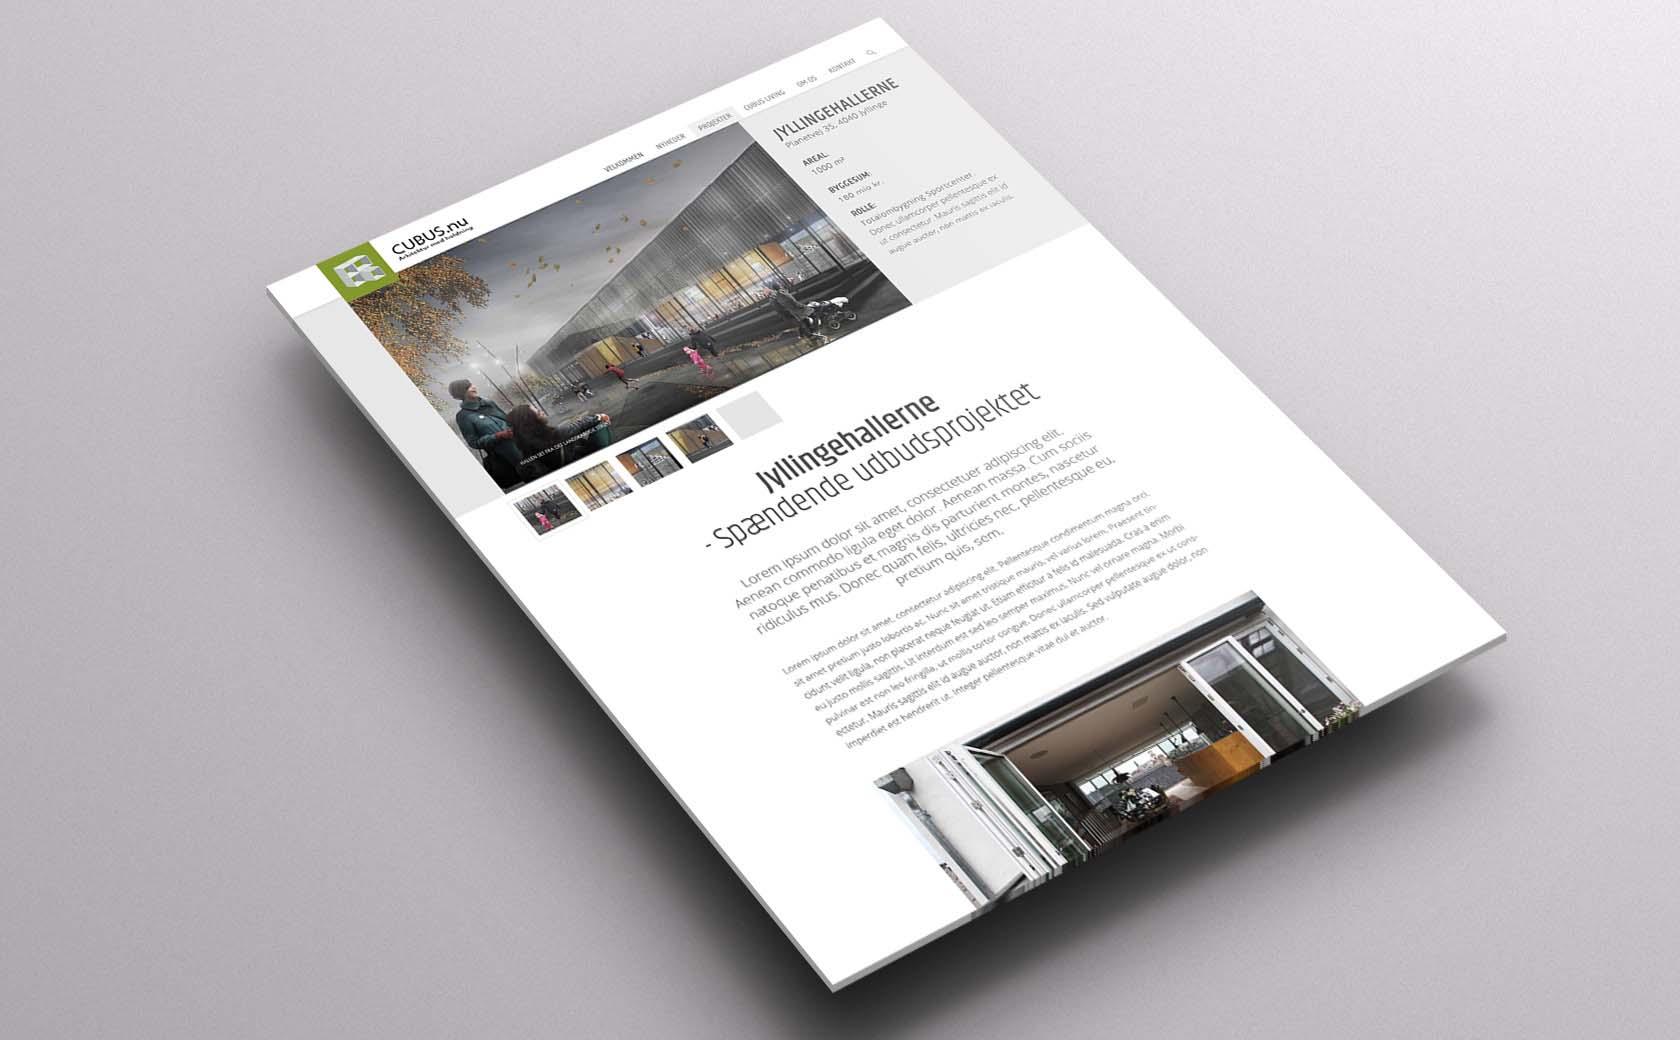 Cobus_iPad_02.jpg